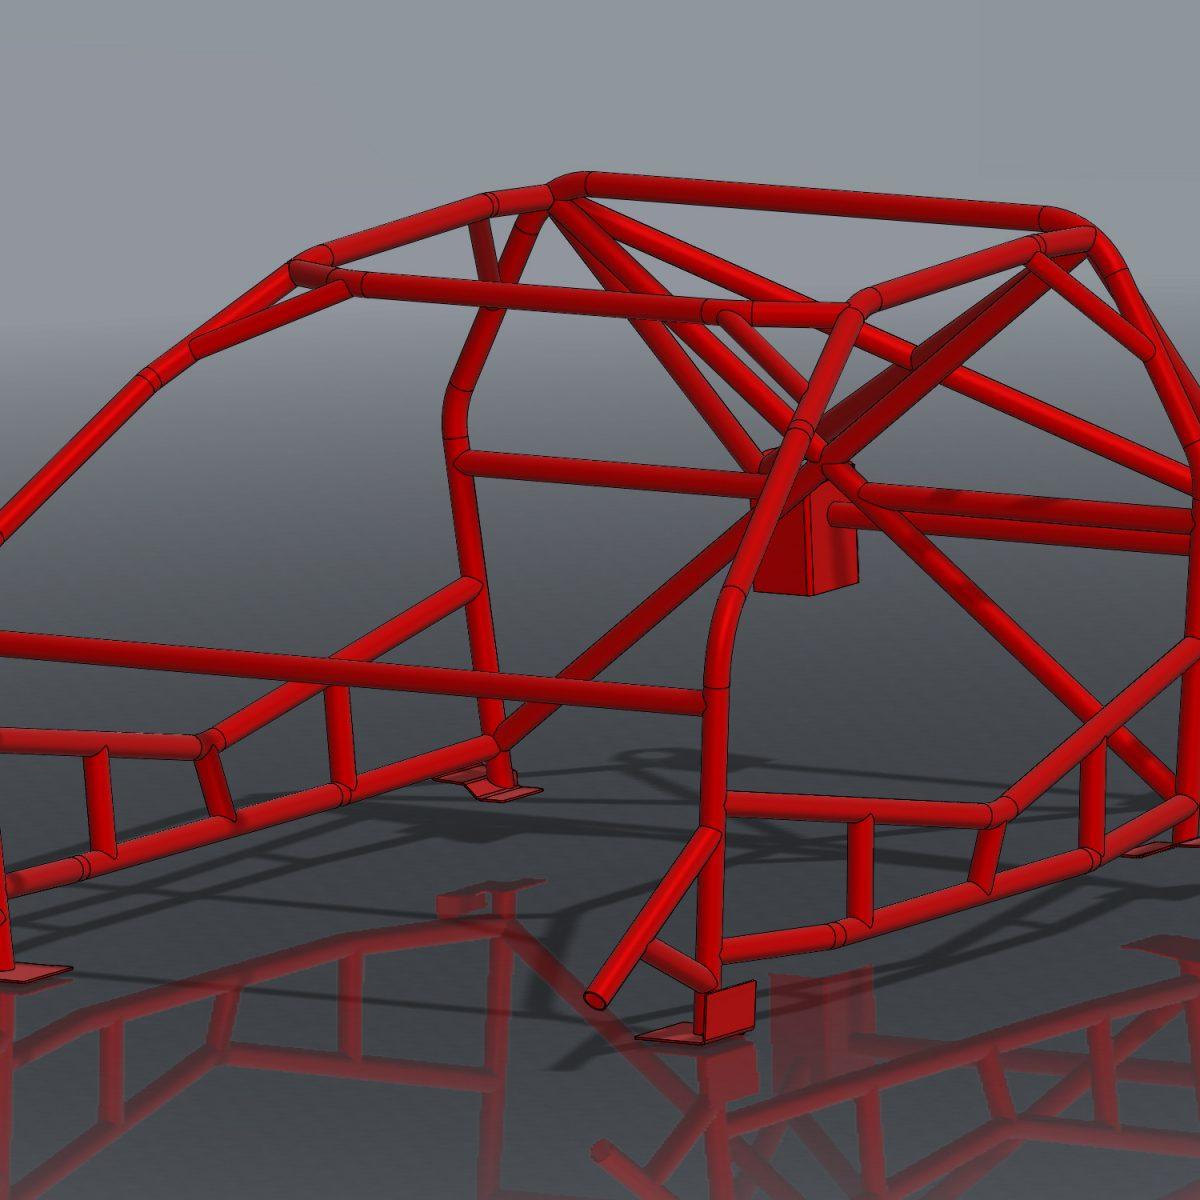 Ultra Tight S13 Formula Drift Roll Cage Kit